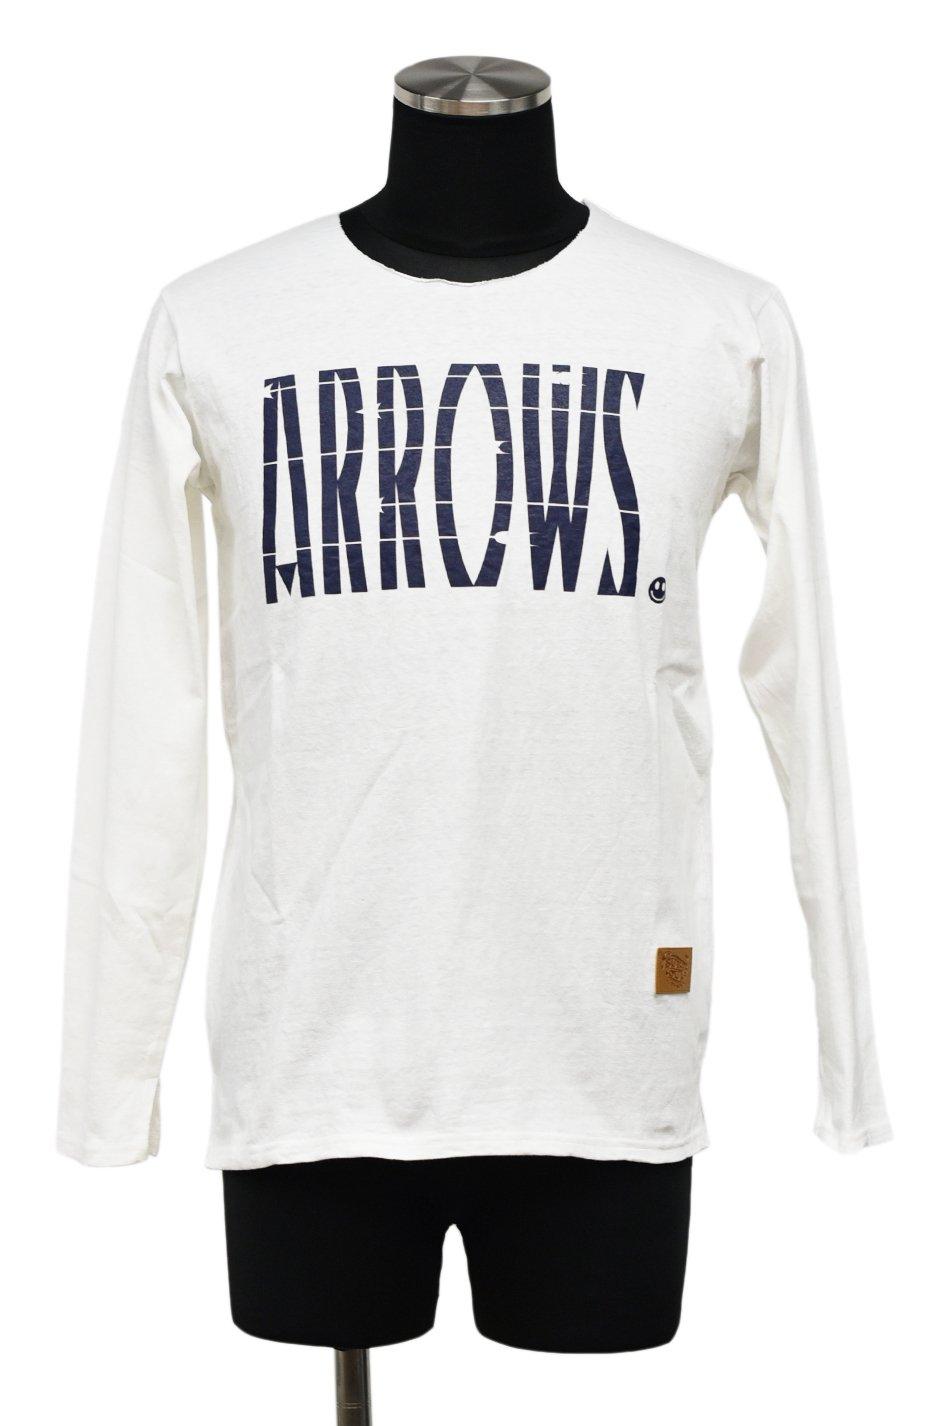 5%off! BURNOUT(バーンアウト )『ARROWS』 ロングスリーブ Tシャツ / ホワイト